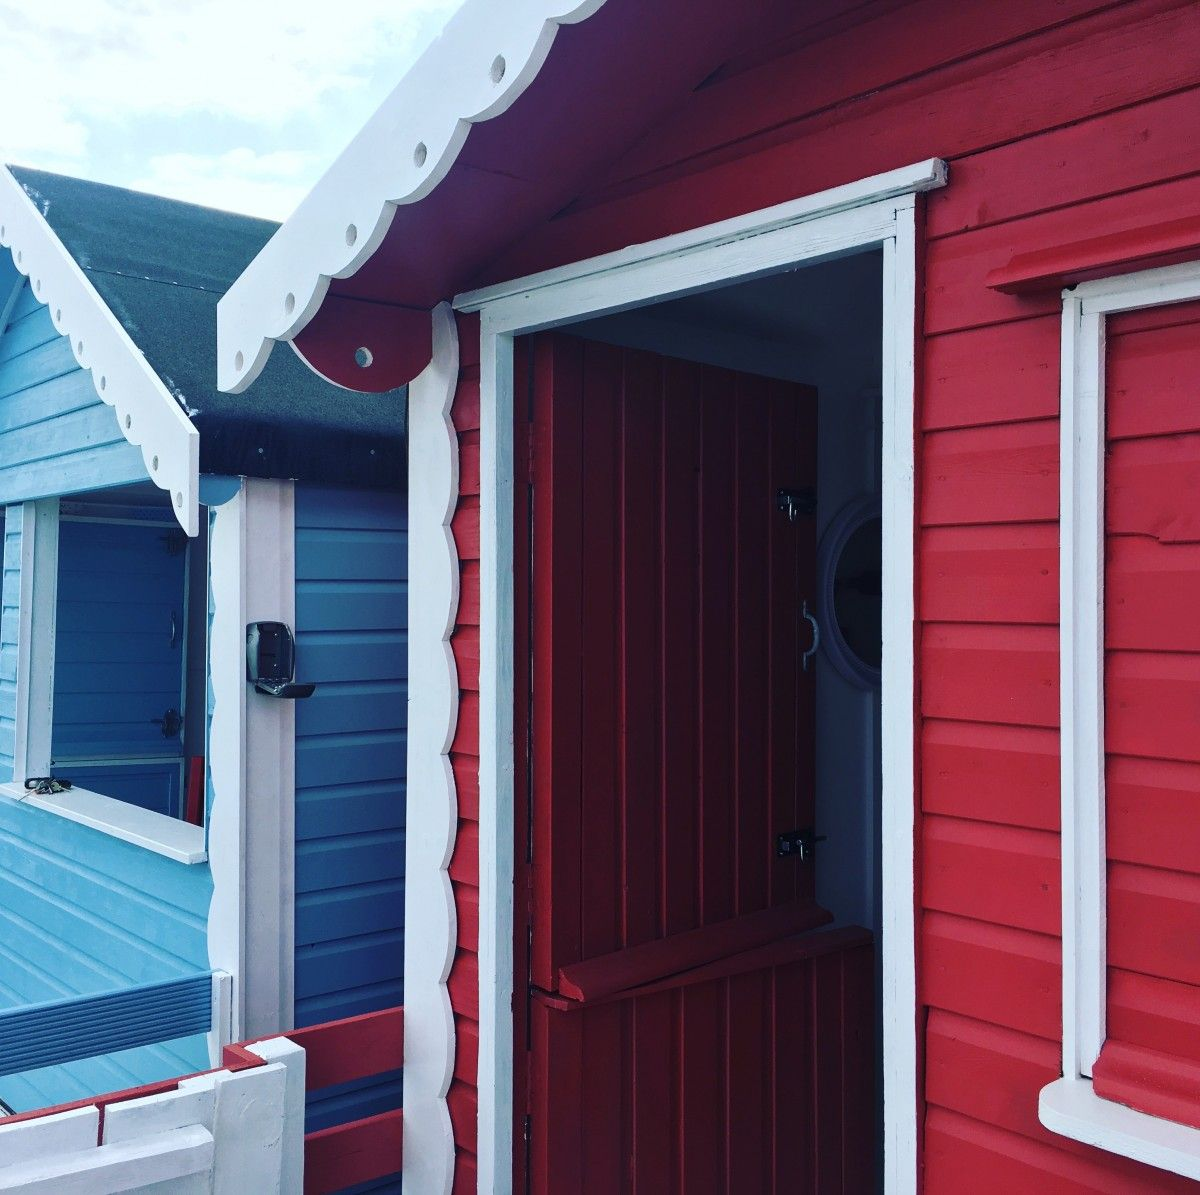 Beach hut decor ideas mickey and minnie exterior paint for Beach hut decoration ideas